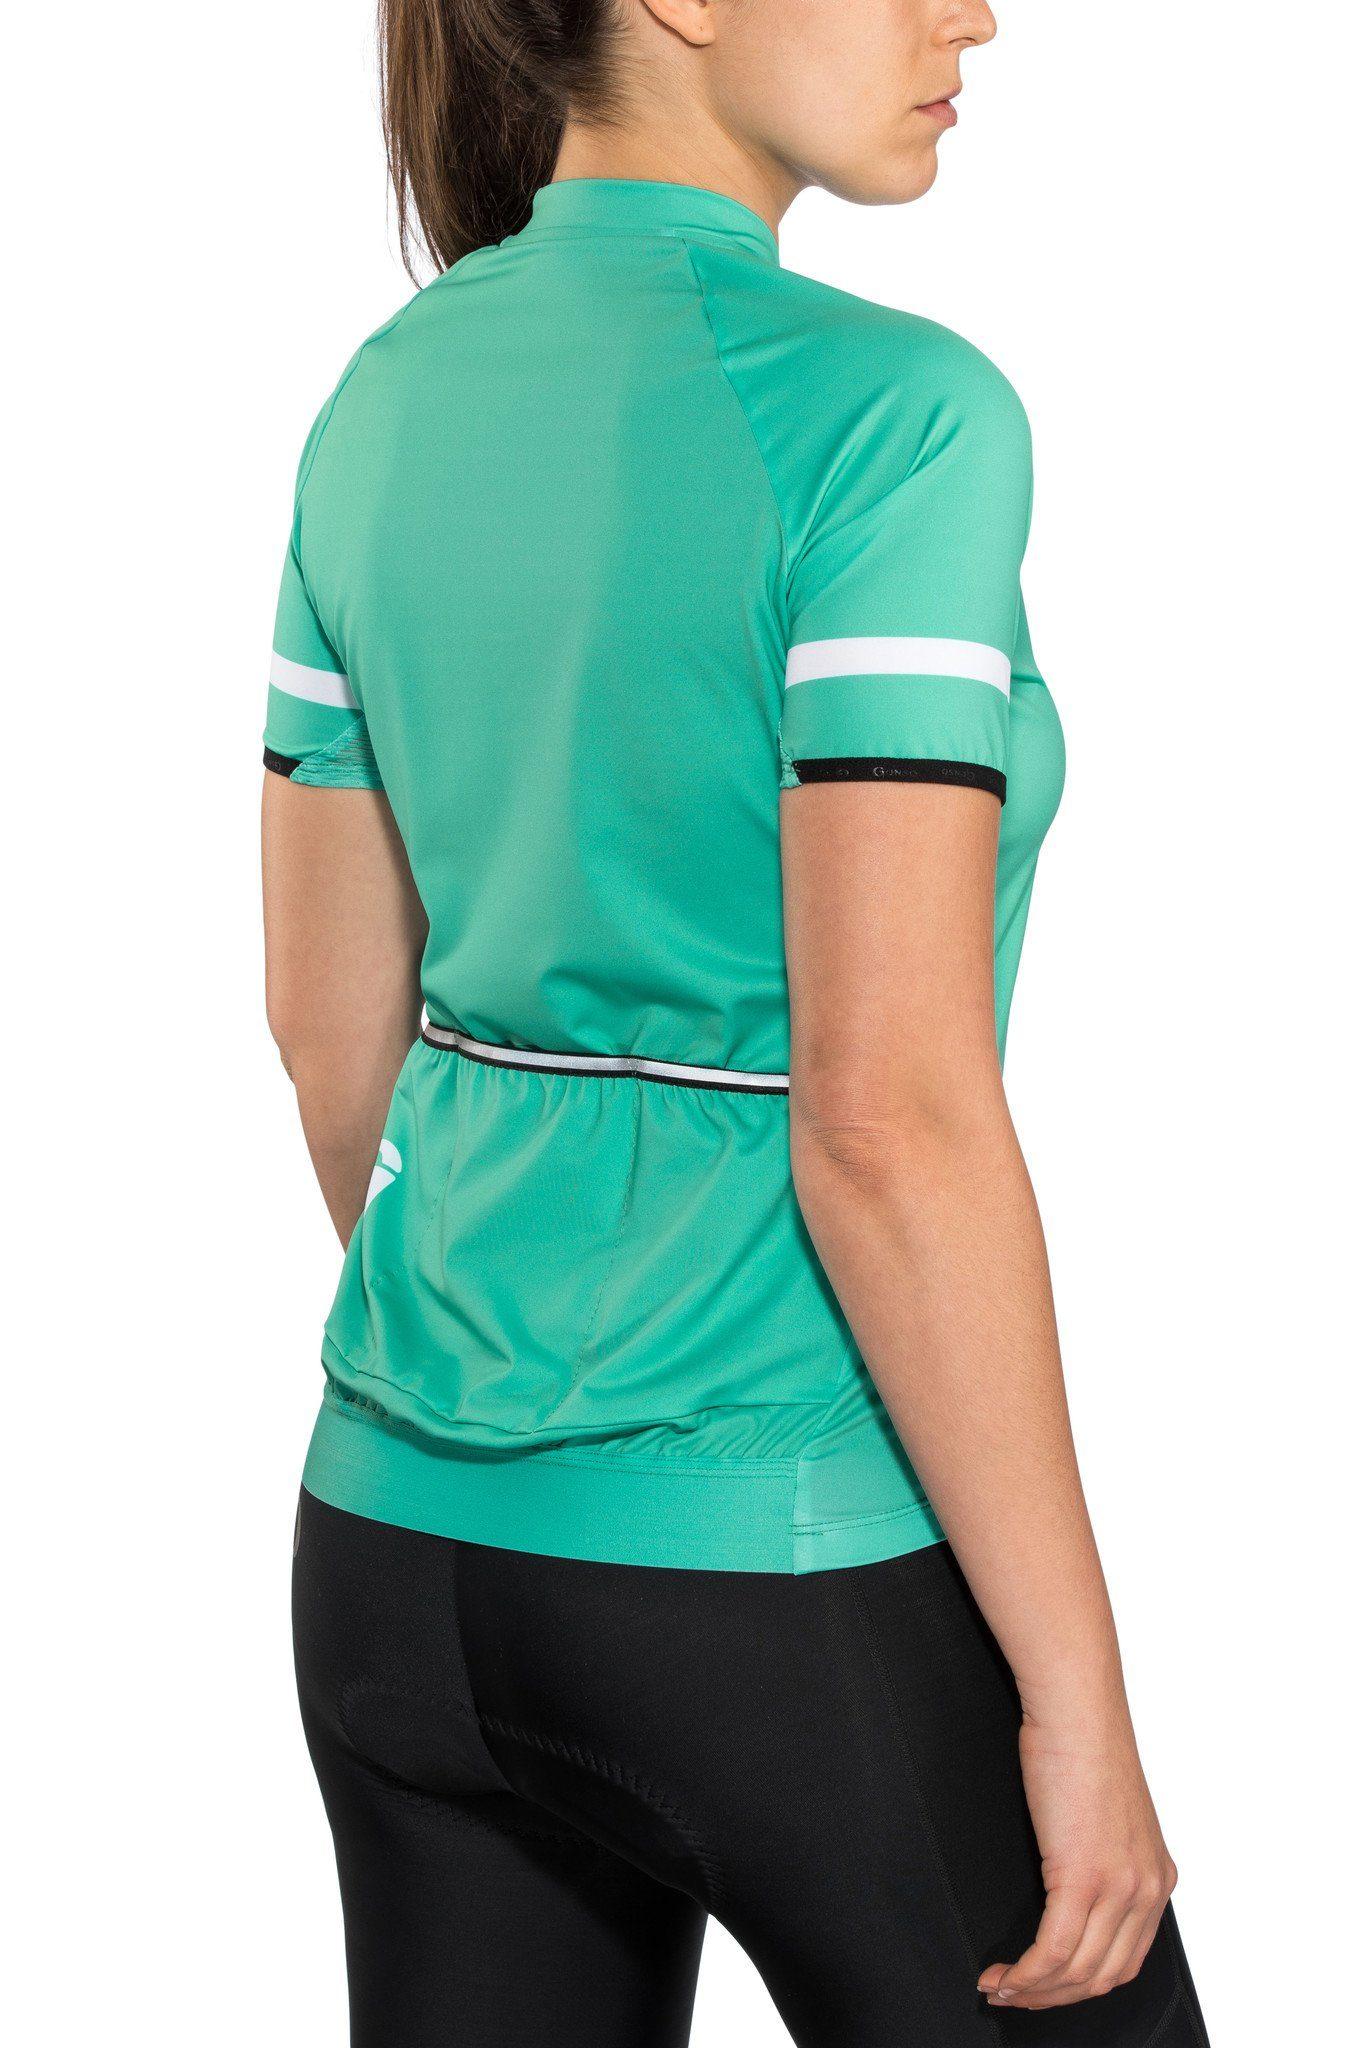 Gonso T-shirt »isoa Trikot Damen« Modelljahr 2019 Online Kaufen